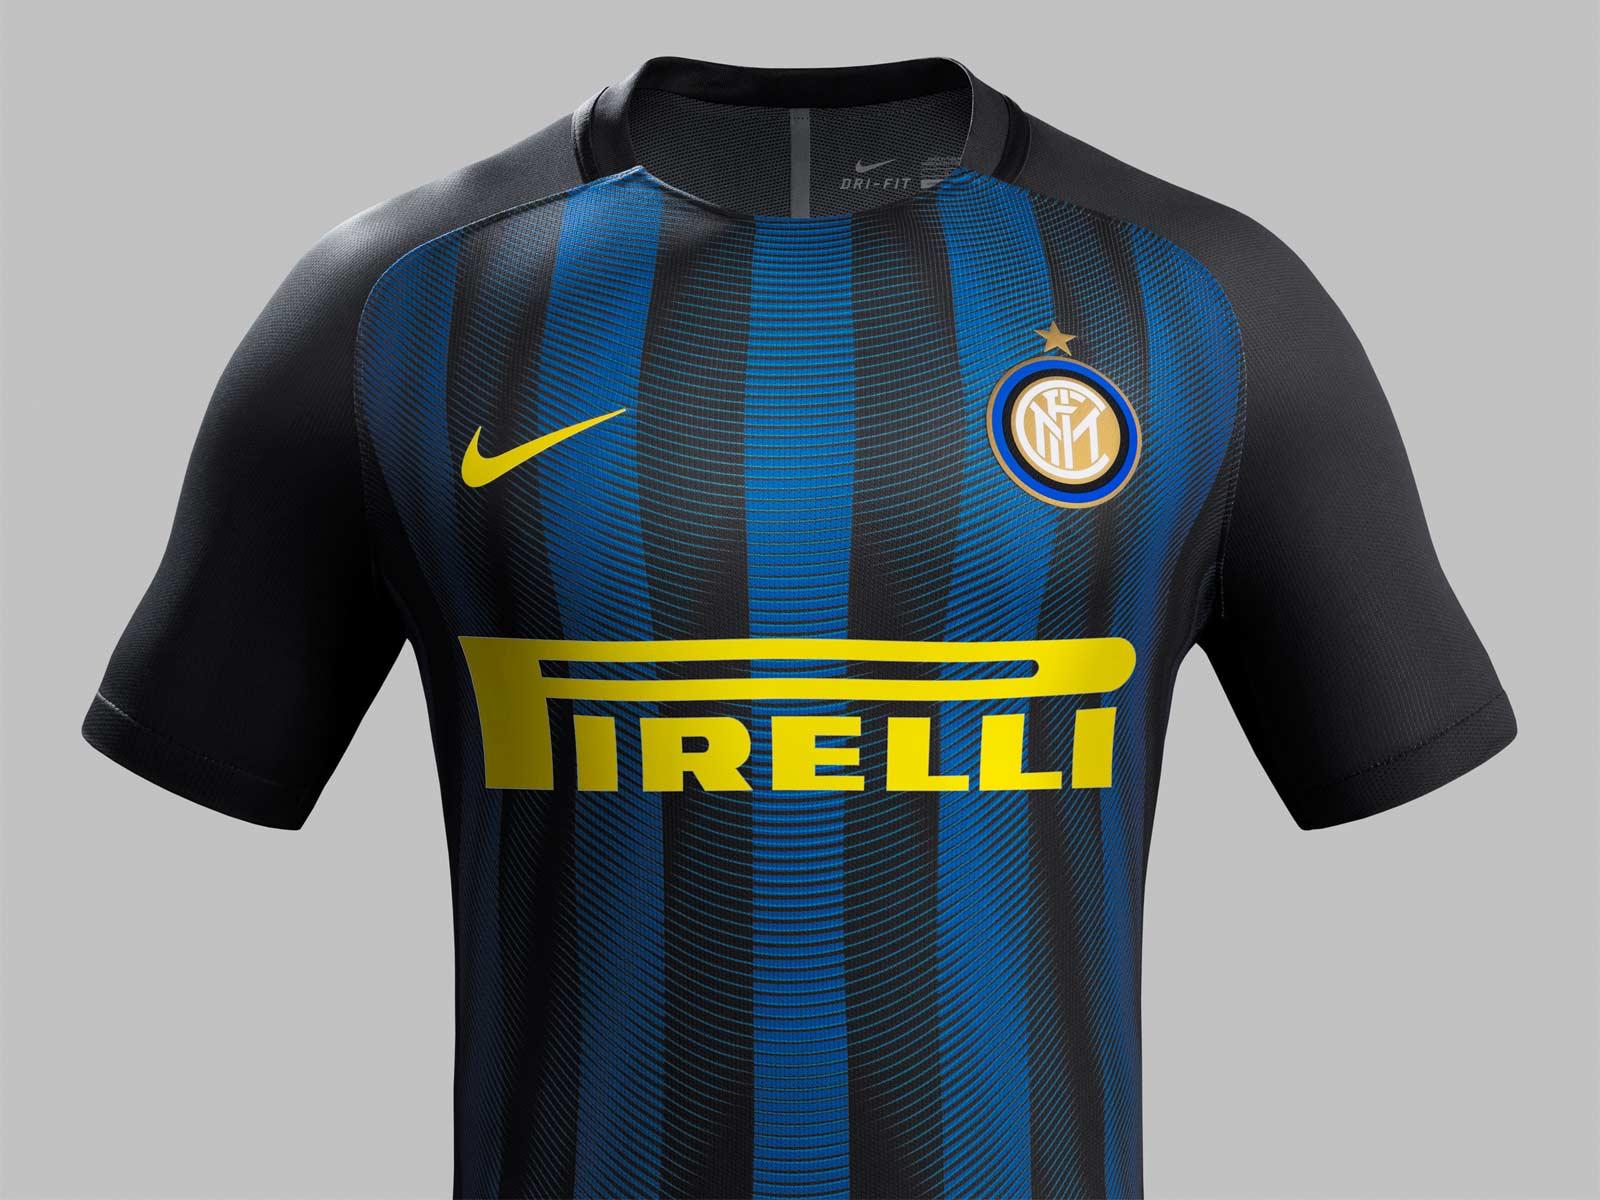 Maillot Inter domicile Nike 2016-17